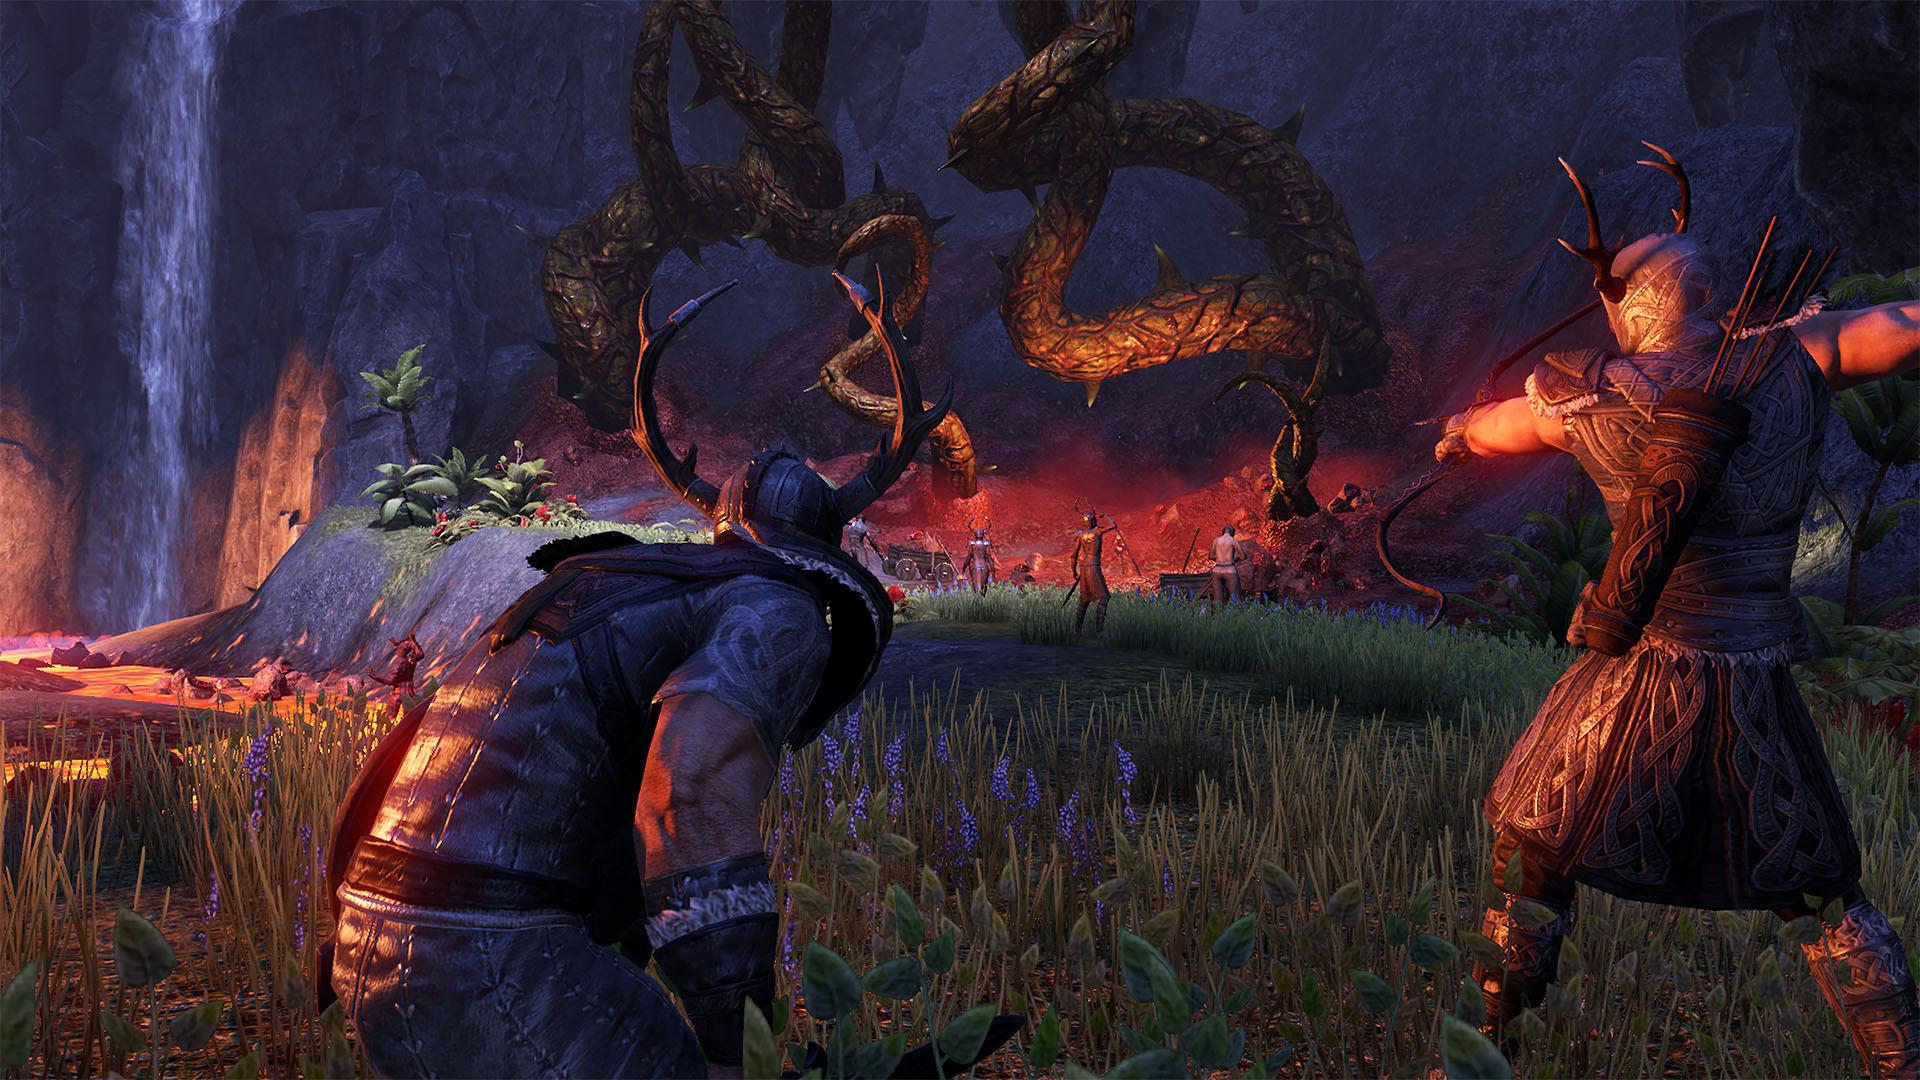 E3 2017: Bethesda Announces Two More Elder Scrolls Online ... Horns Of The Reach